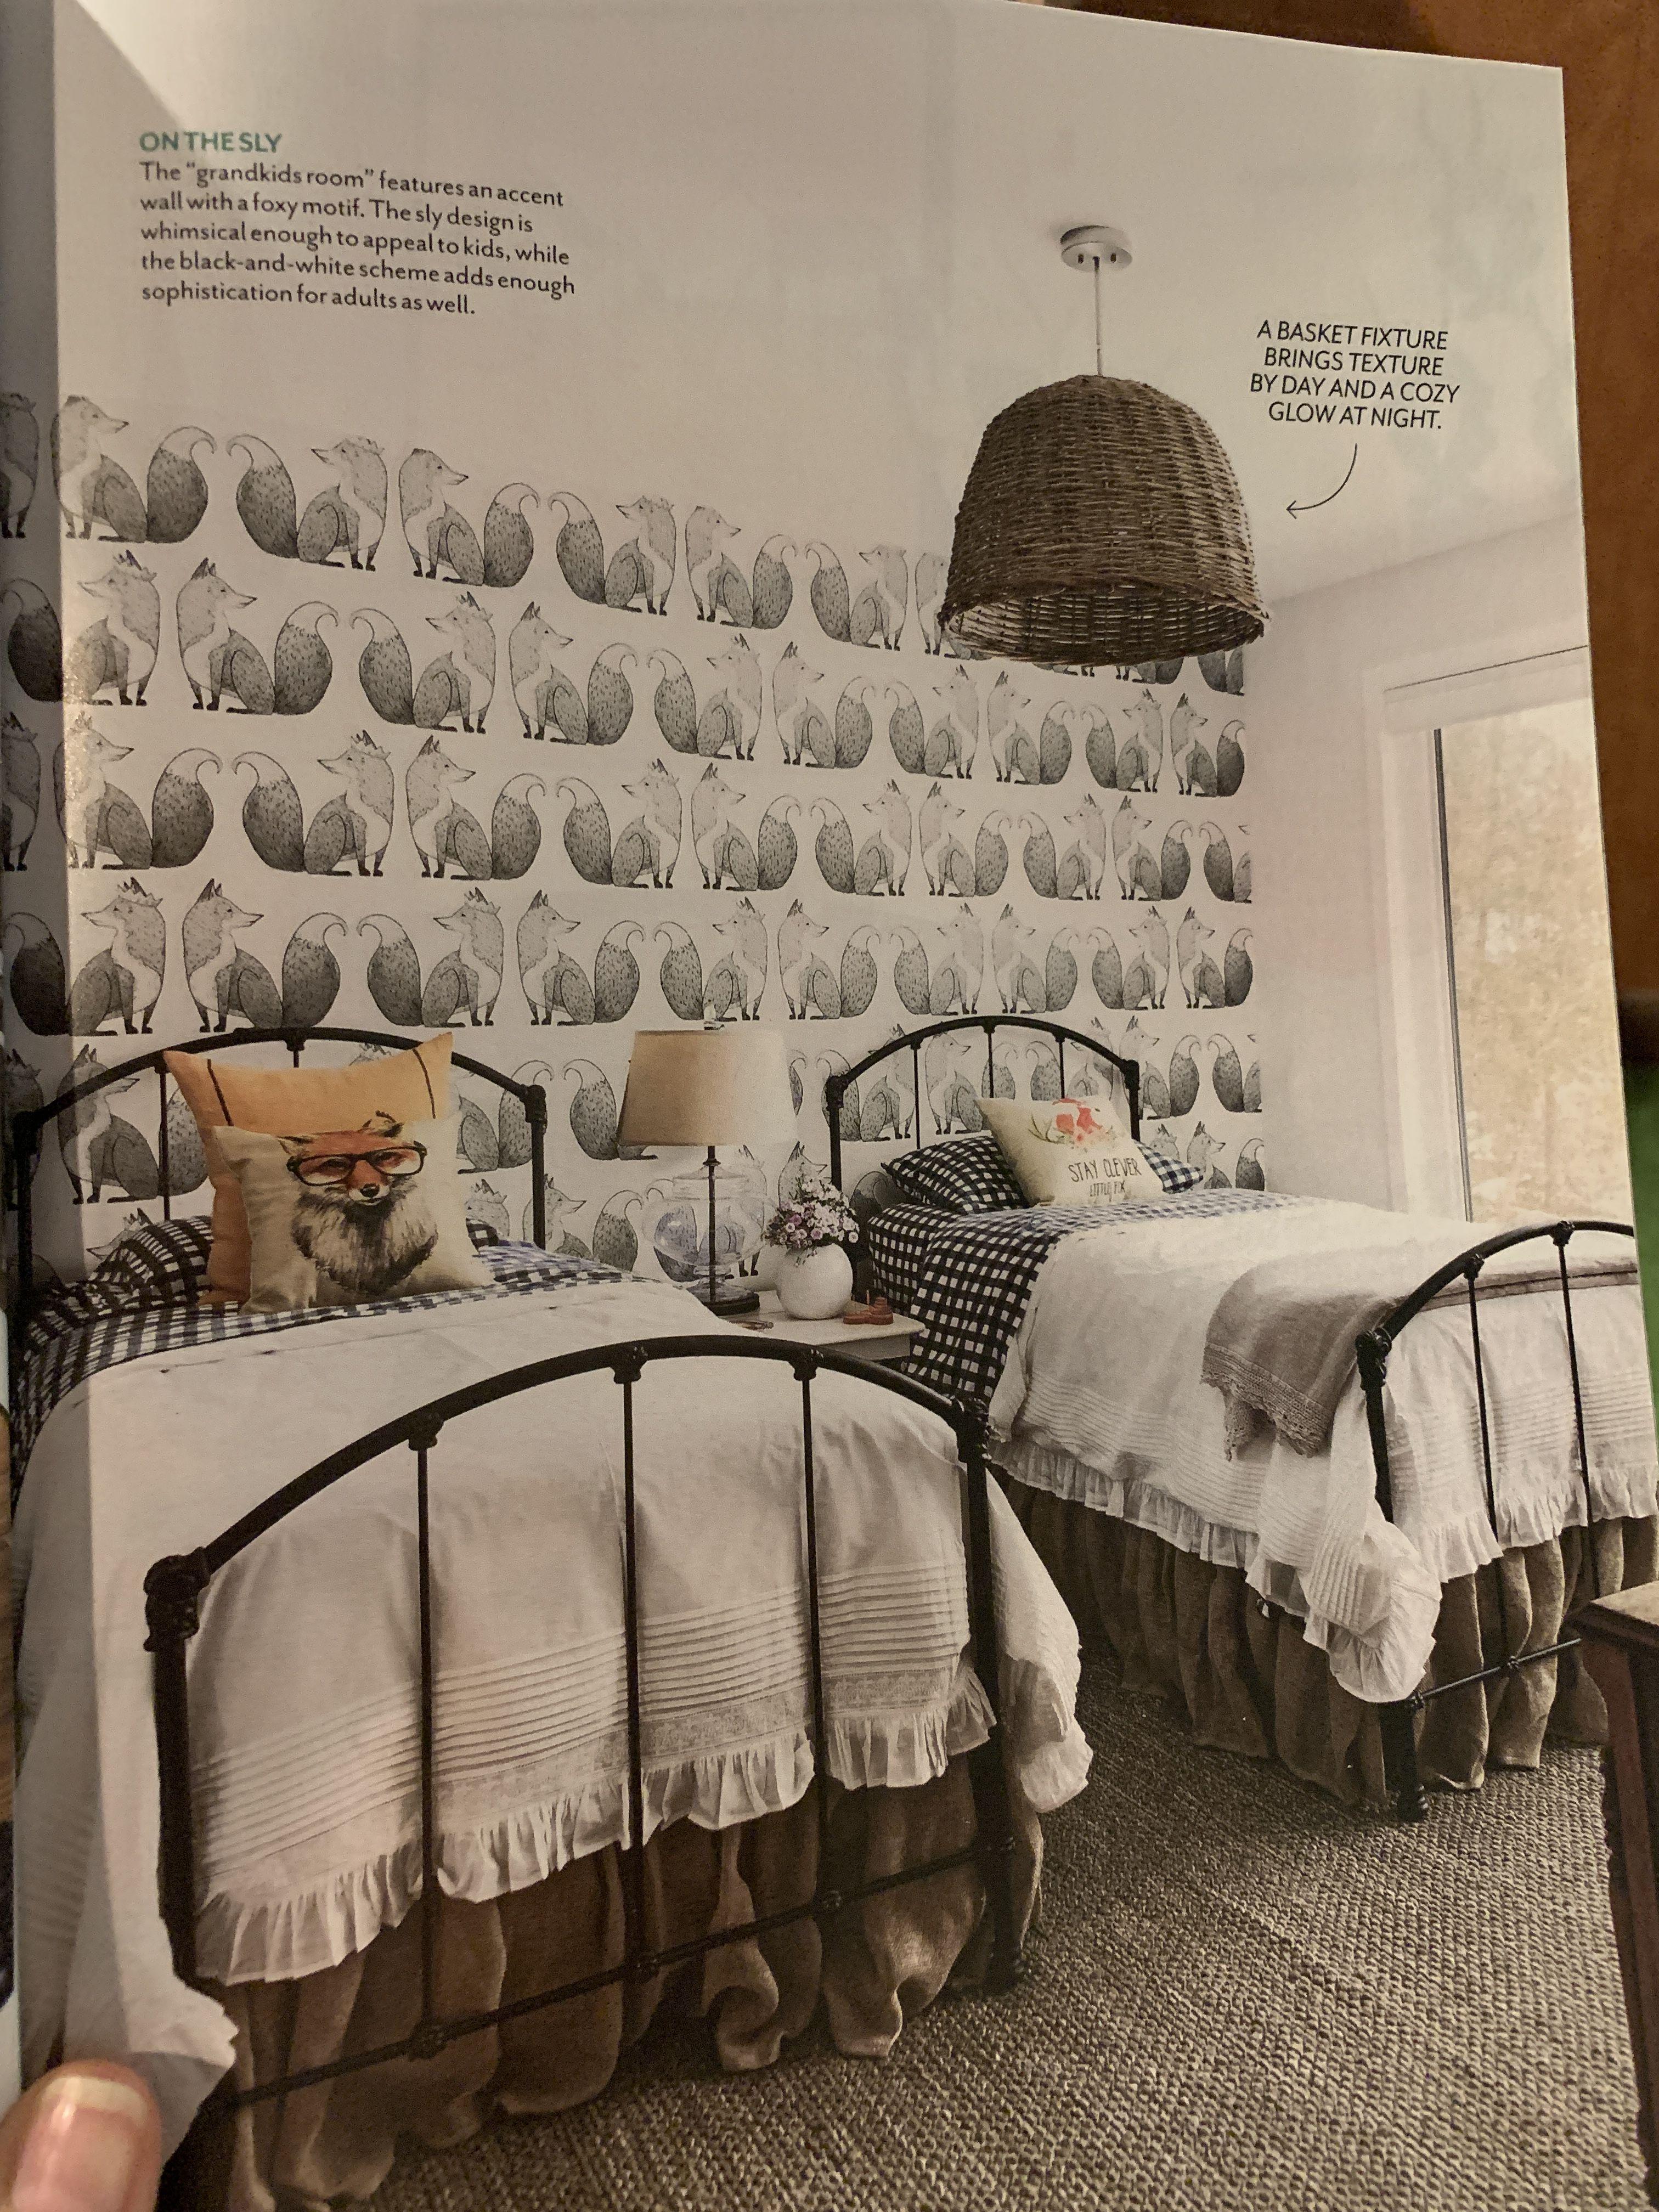 Cute Wallpaper For Grandkid Space Home Decor Bonus Room Furniture